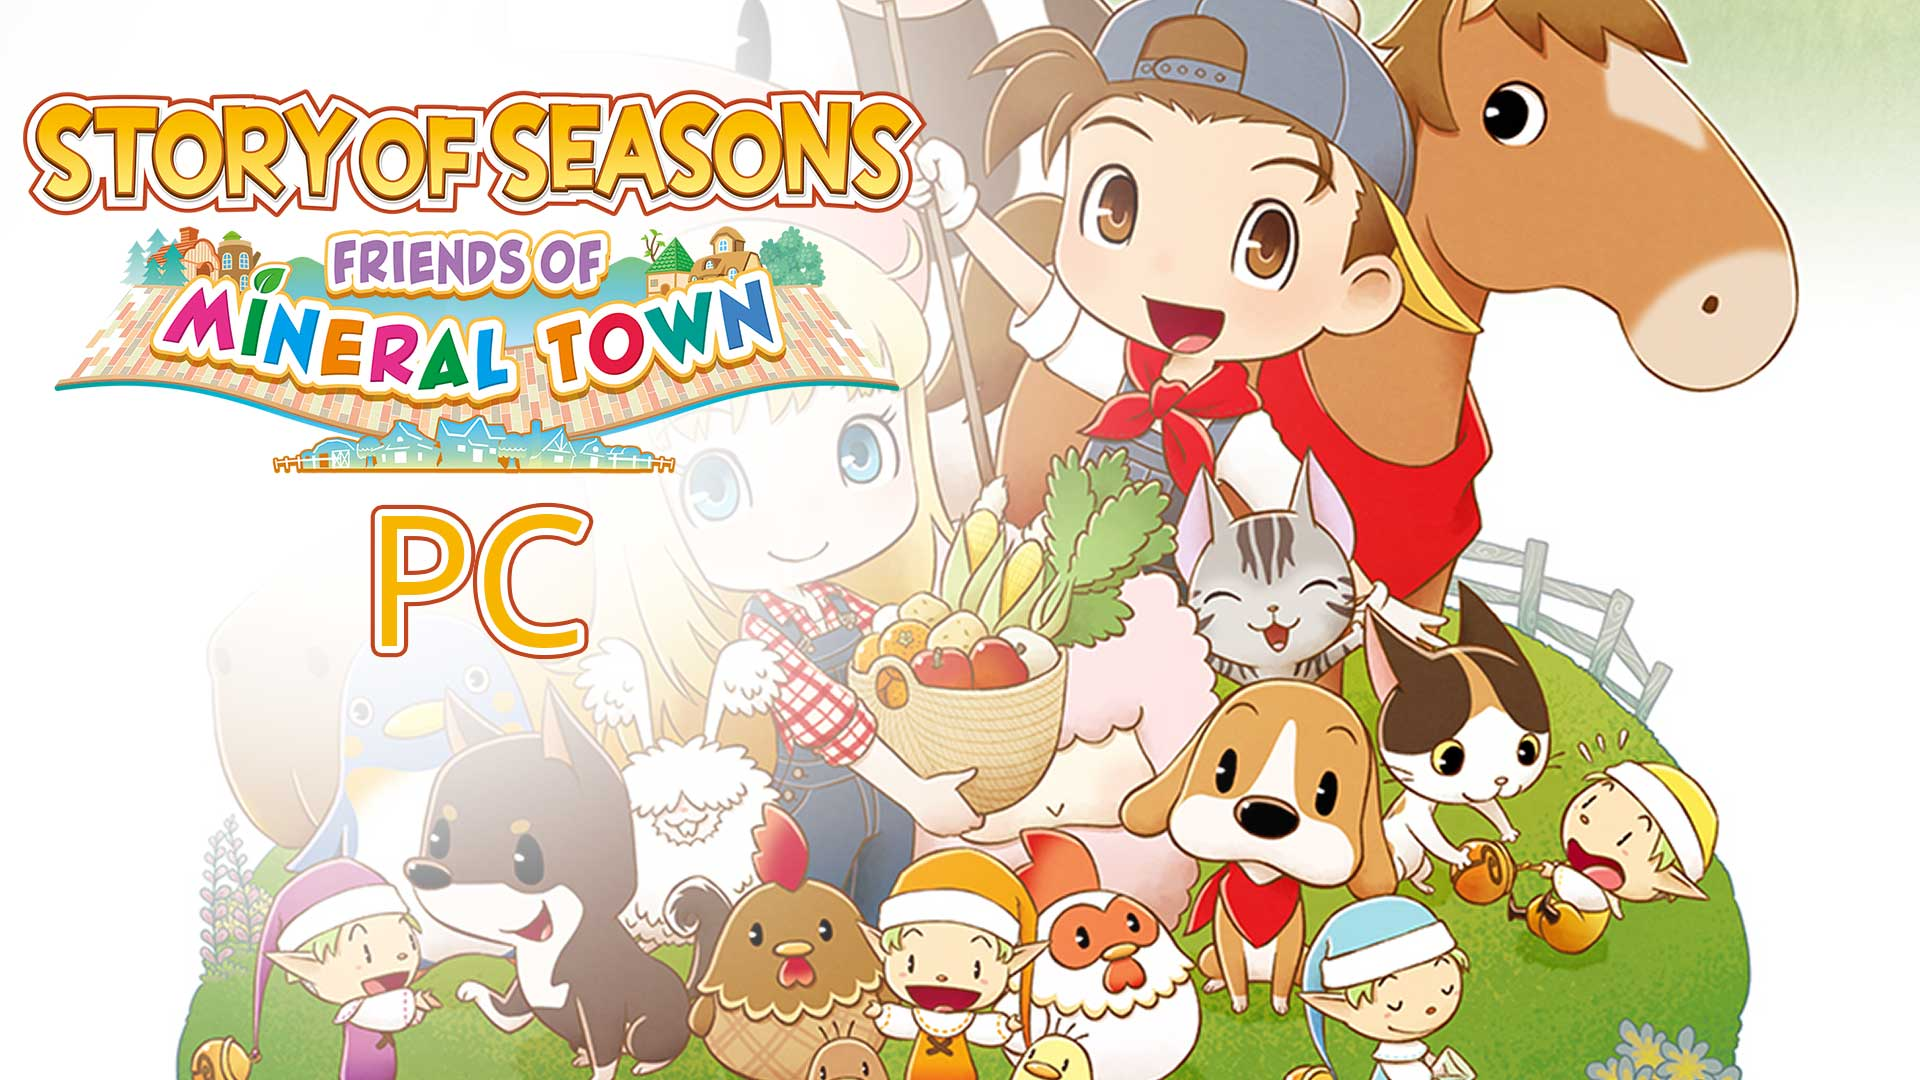 story of seasons mineraltown pc